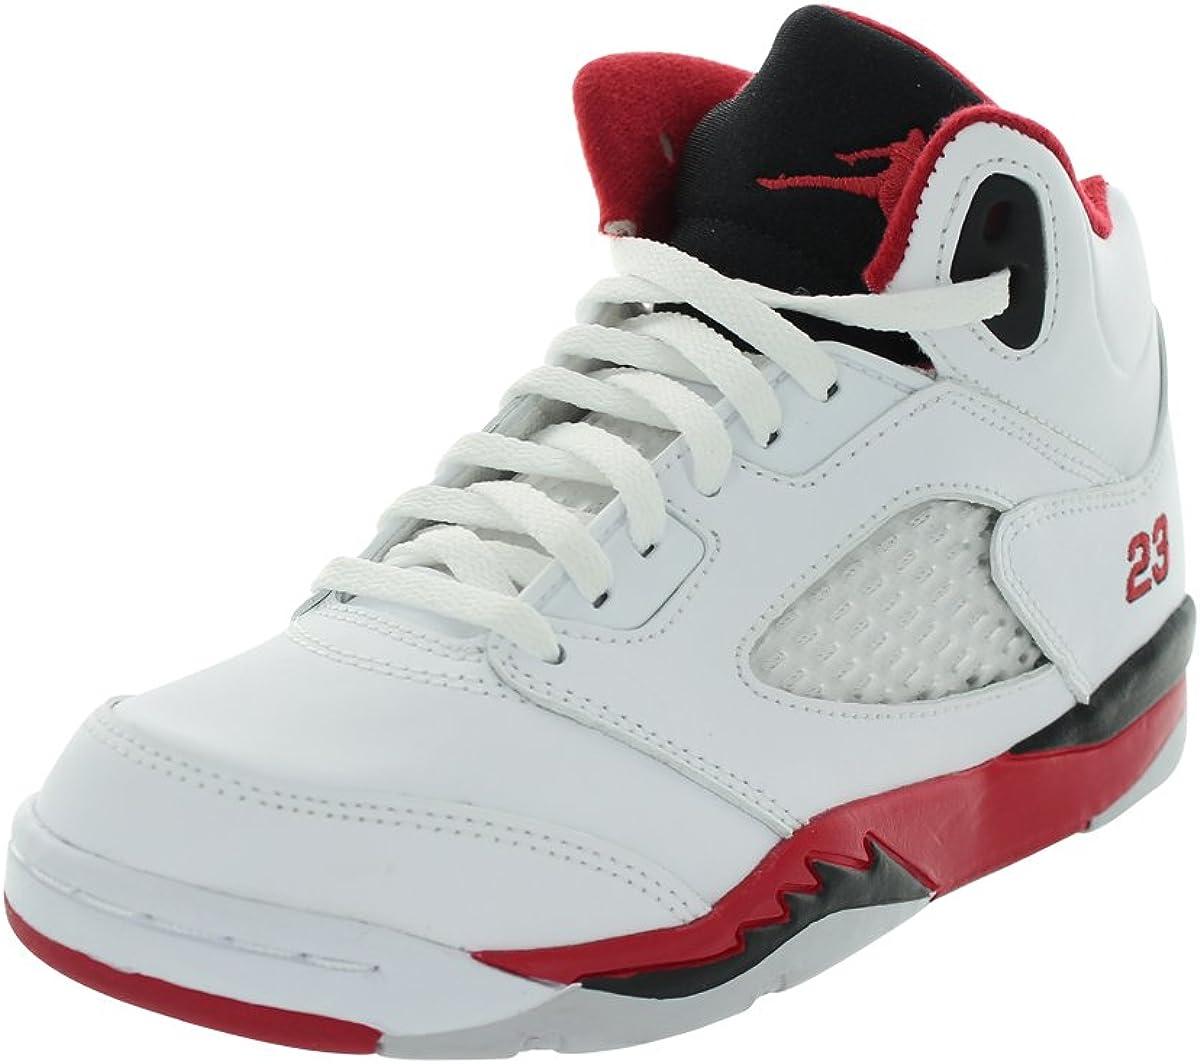 Jordan Nike 5 Retro White/Fire Red Kids (PS) Pre-School 440889-120 (Size: